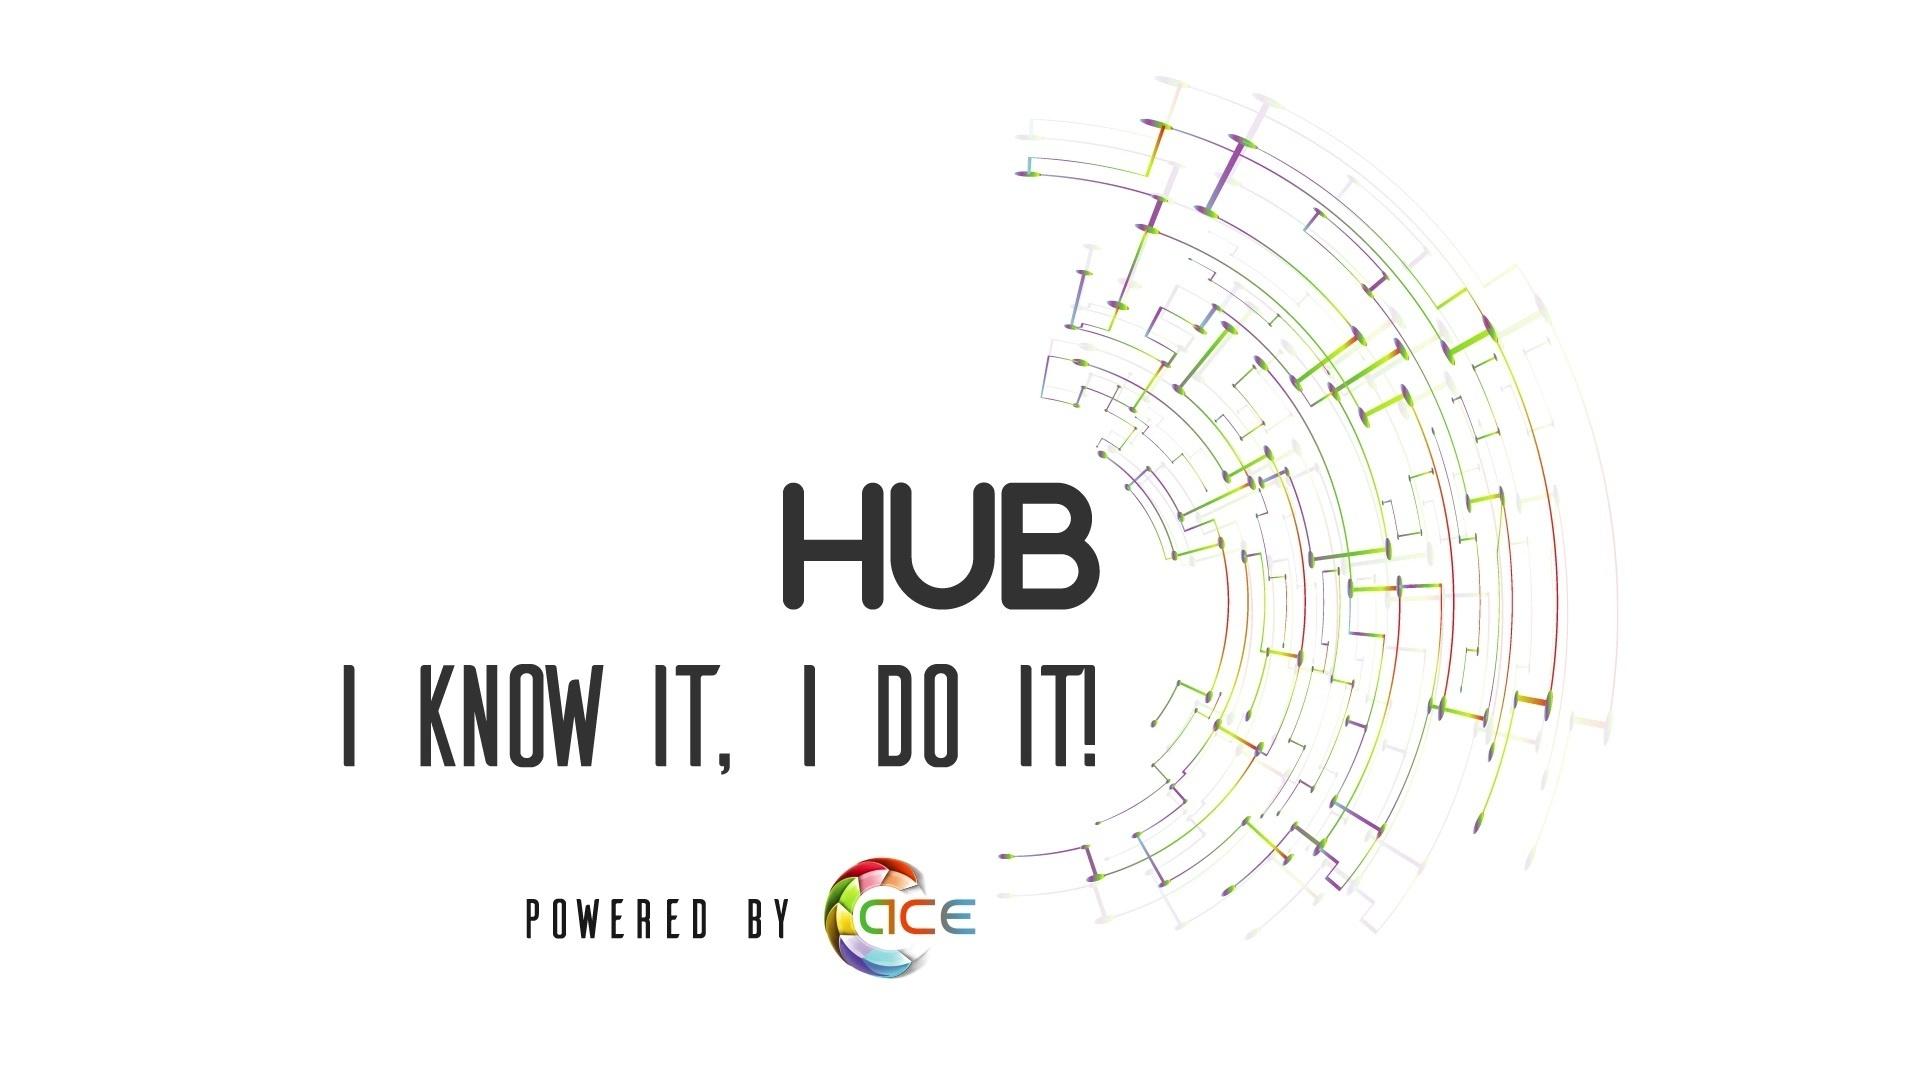 HUB de antreprenoriat – I know it, I do it!